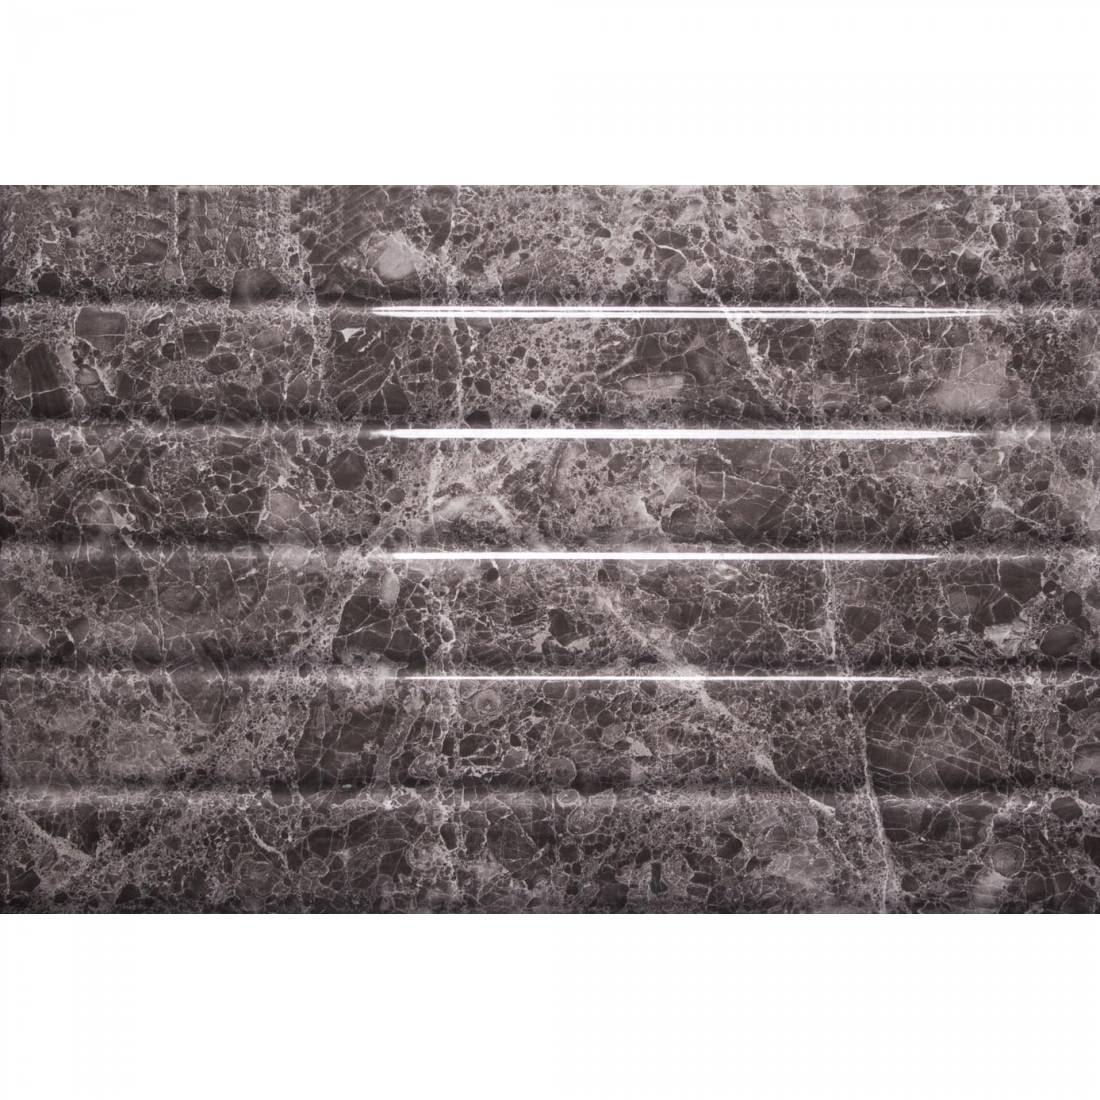 Stroud Relief Decor 30x45 Dark Grey 1